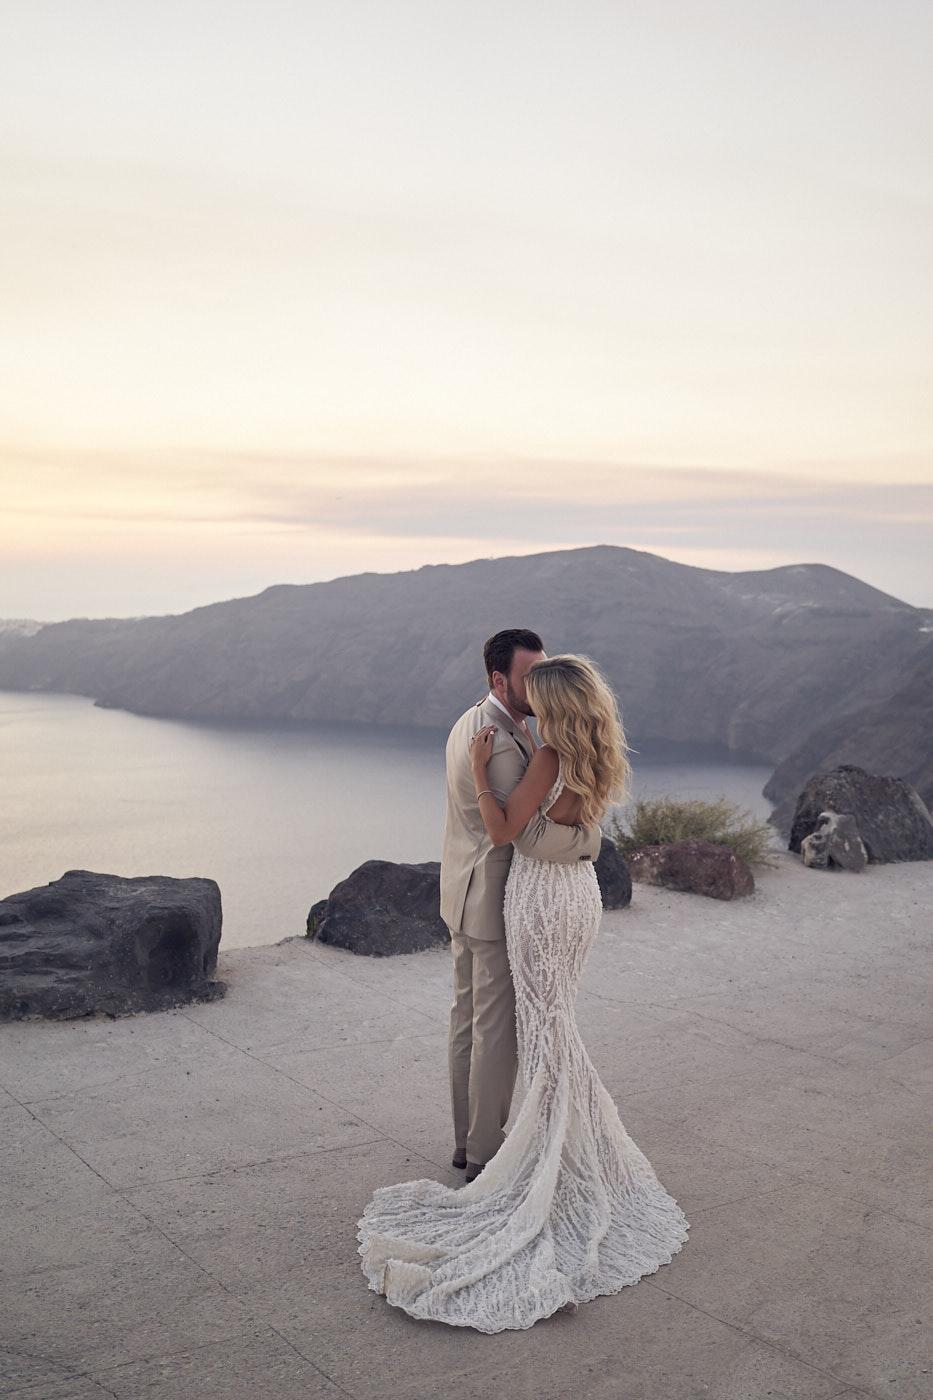 GandJ_santorini-wedding_Lostinlove 183.jpg